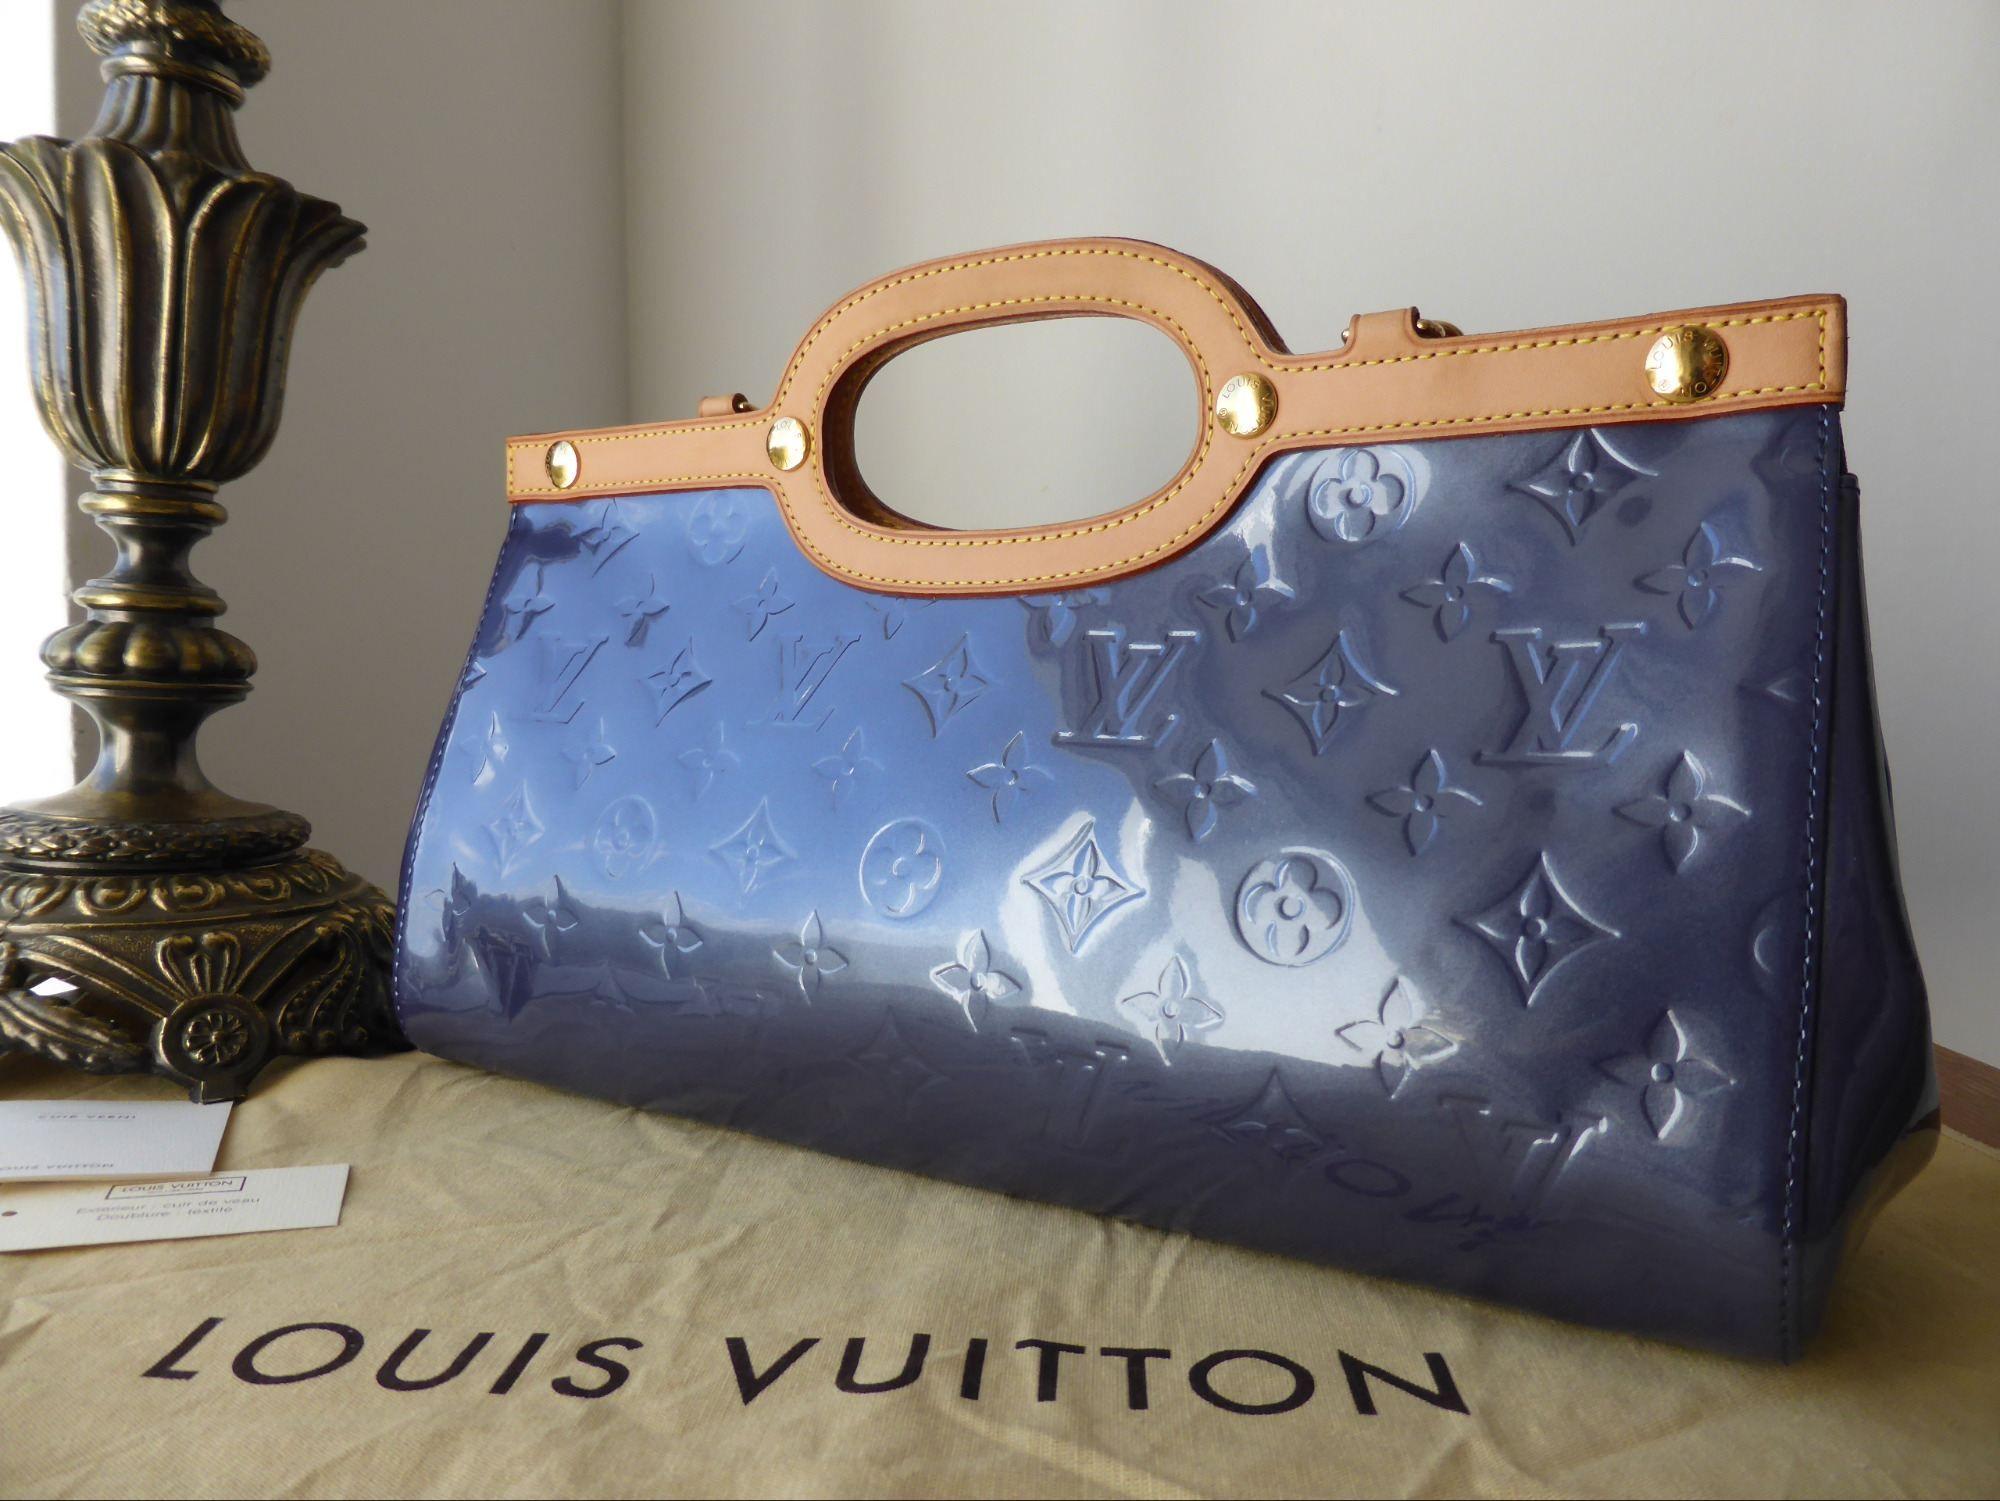 Louis Vuitton Roxbury Drive In Indigo Vernis Npnbags Co Uk Naughtipidginsnest Prod 4878723